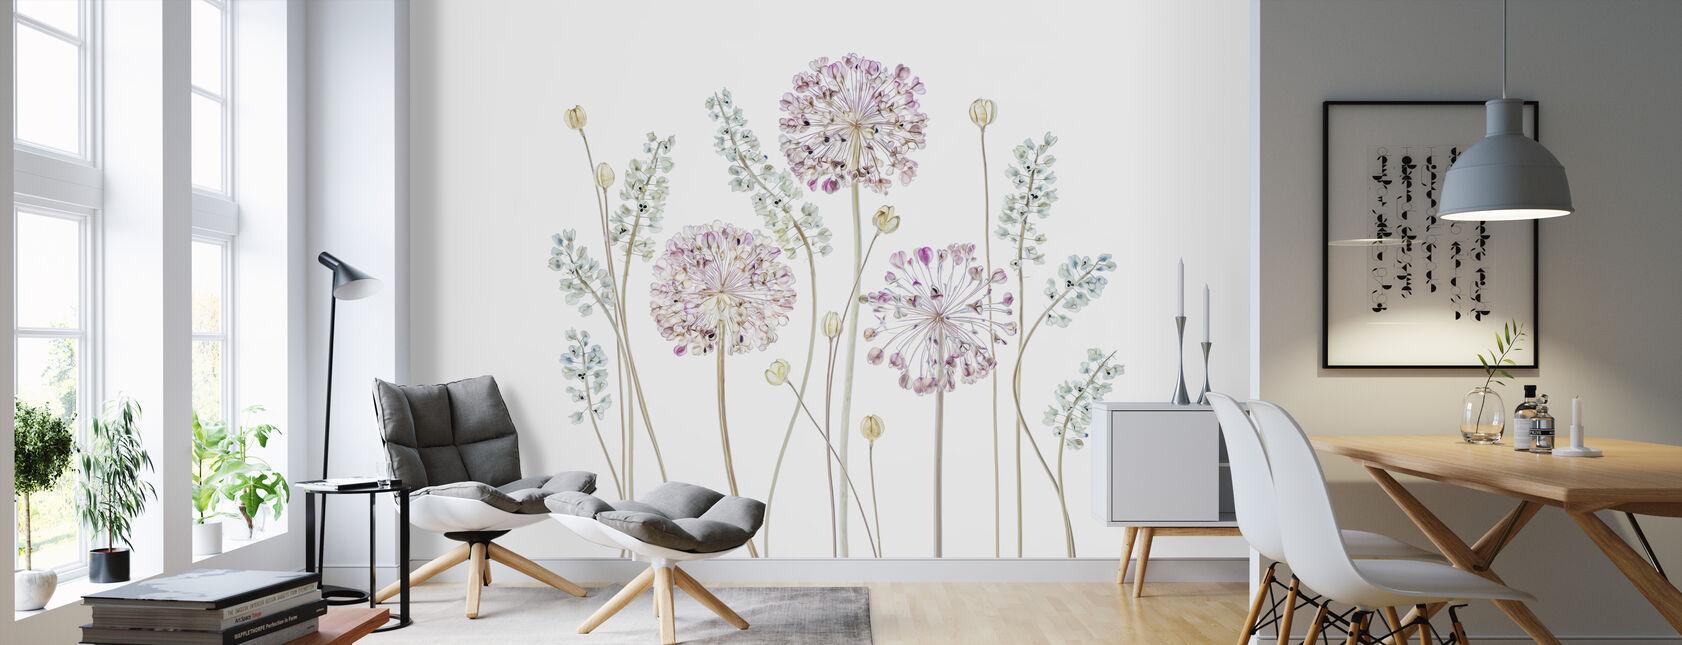 Allium - Wallpaper - Living Room